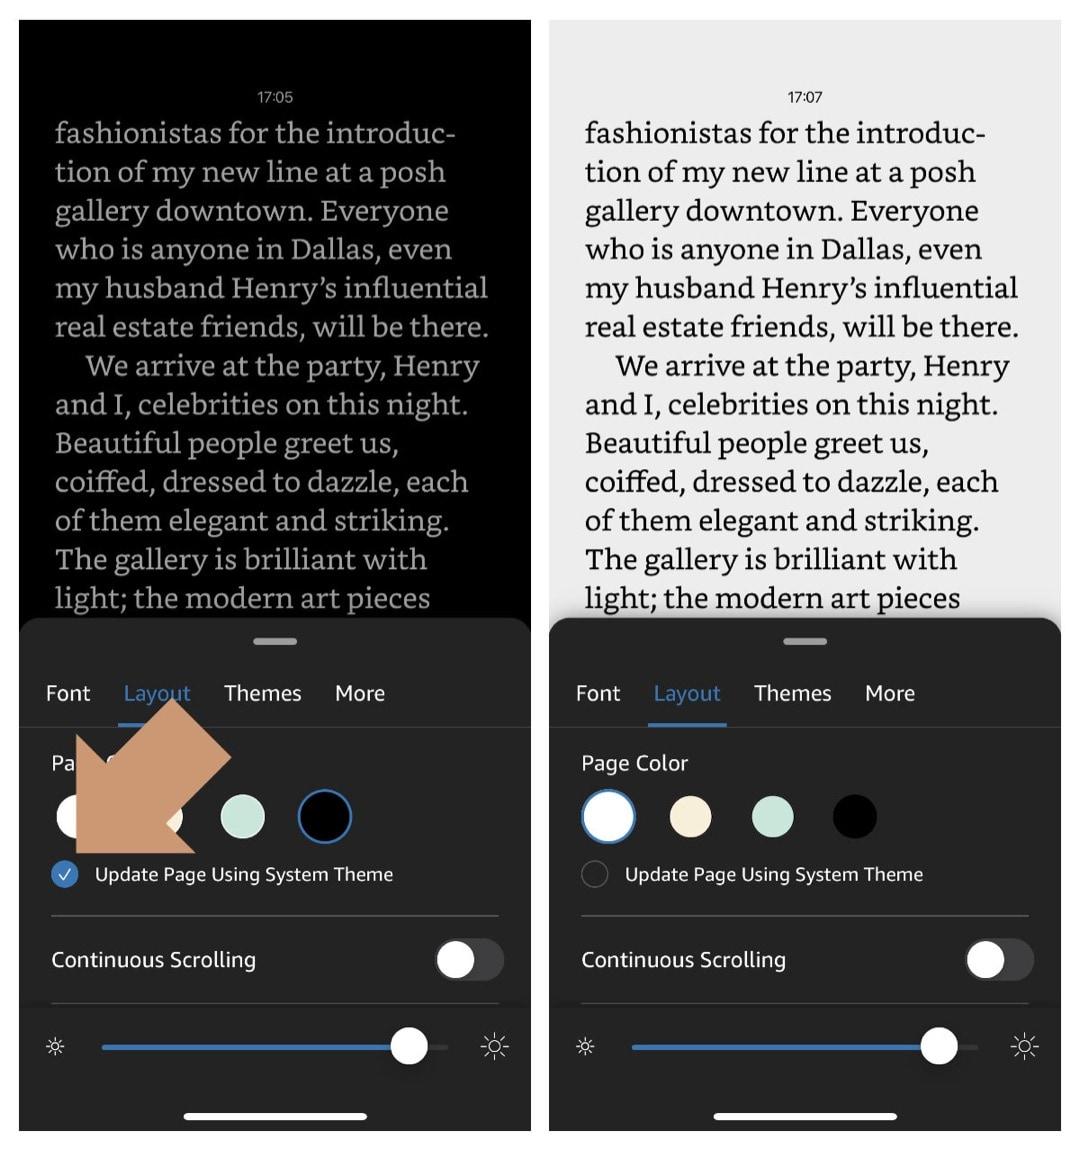 Amazon Kindle iPad - disable automatic color switcher